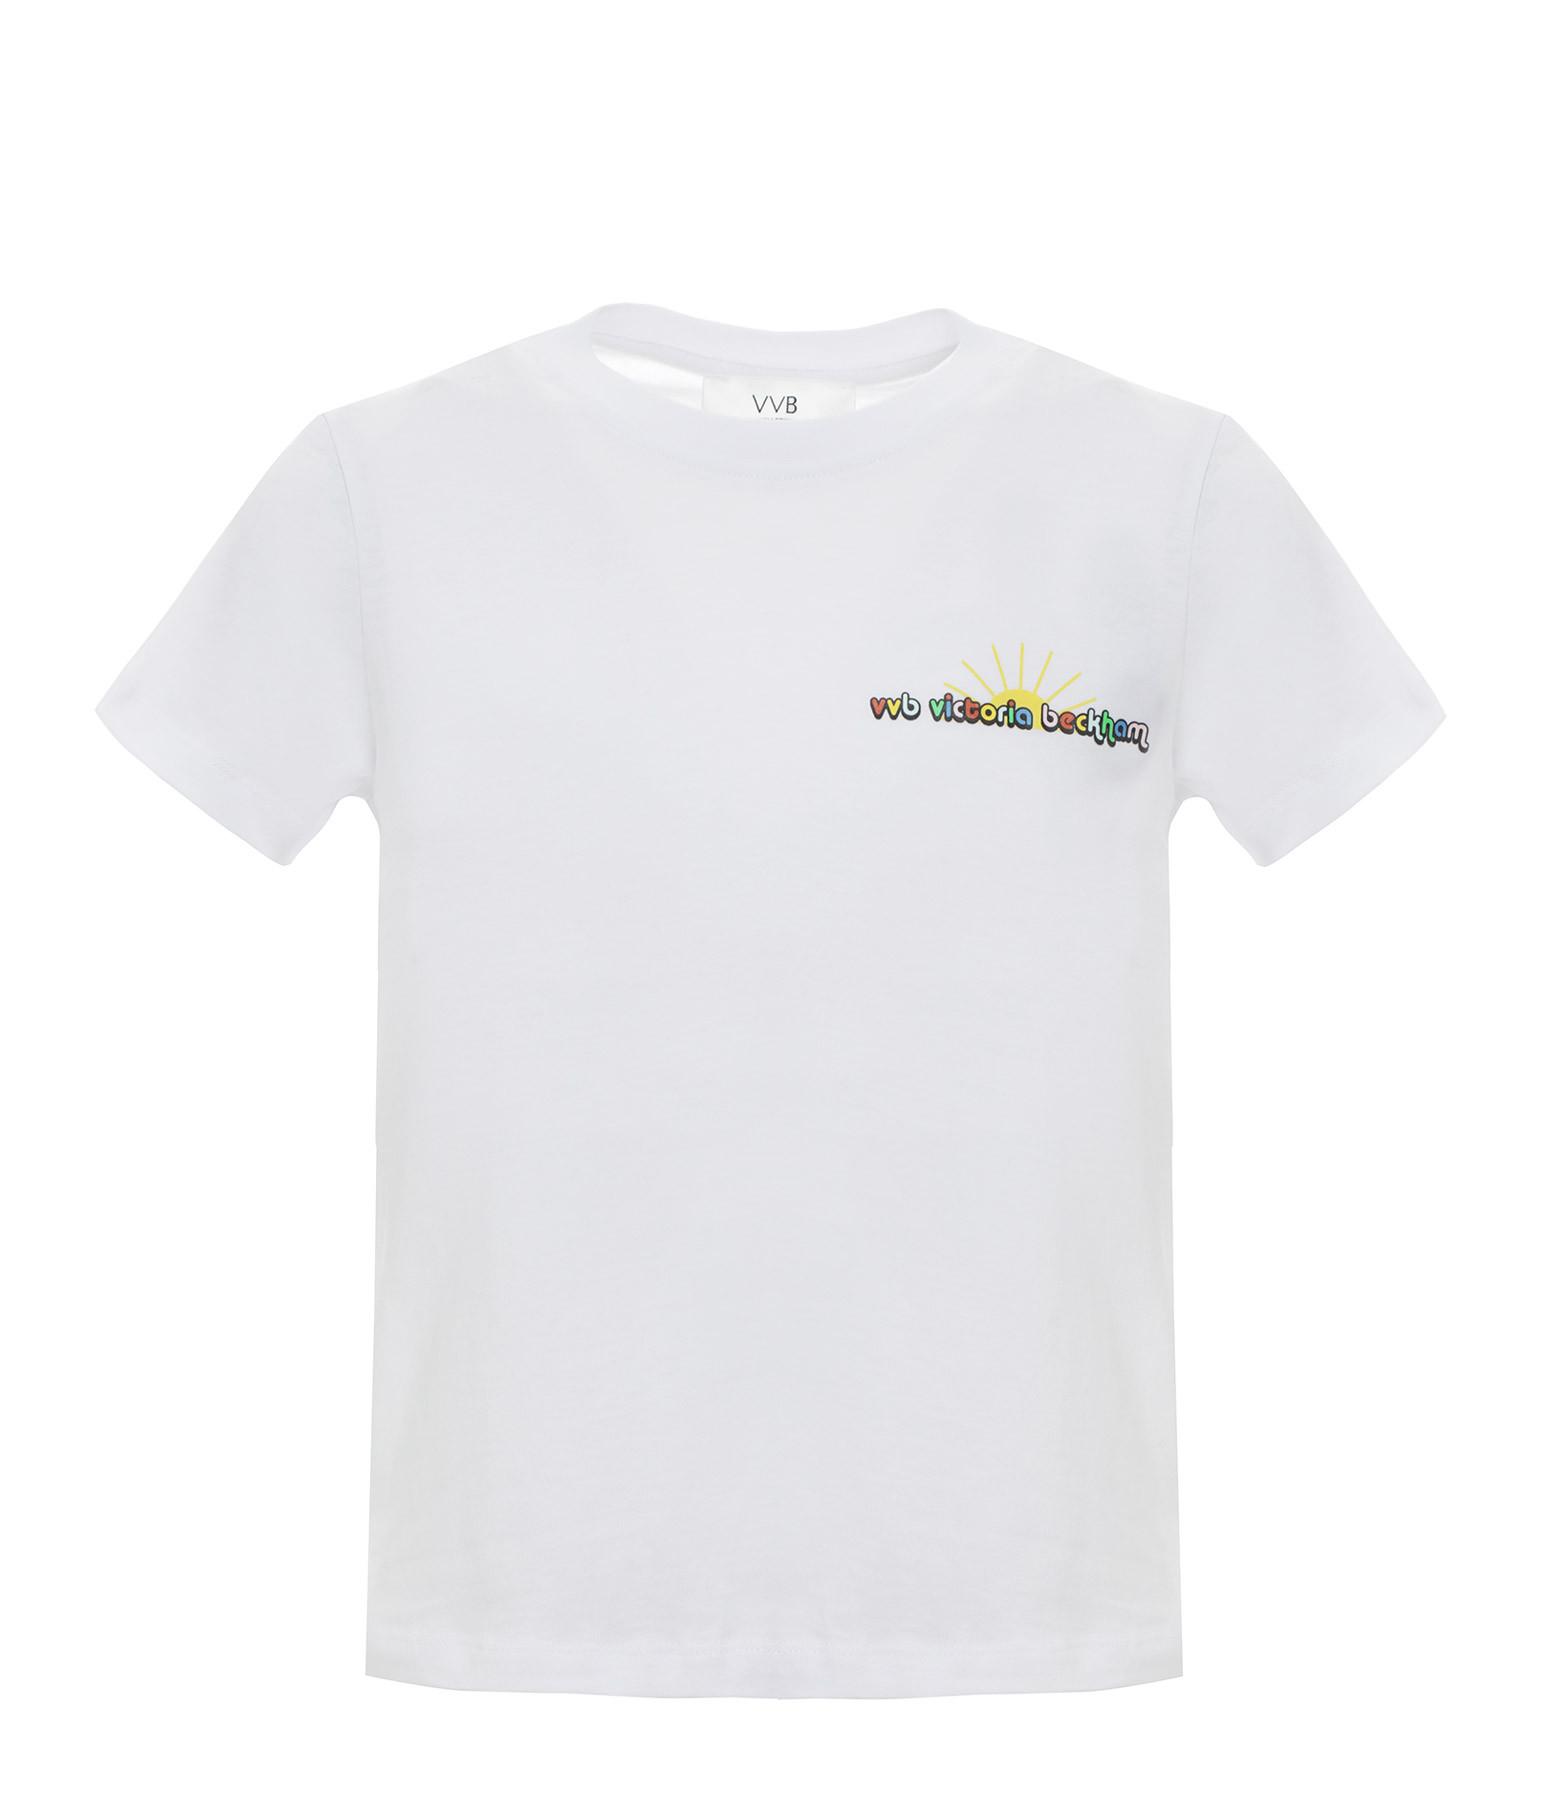 VICTORIA VICTORIA BECKHAM - Tee-shirt Logo Slim Fit Blanc